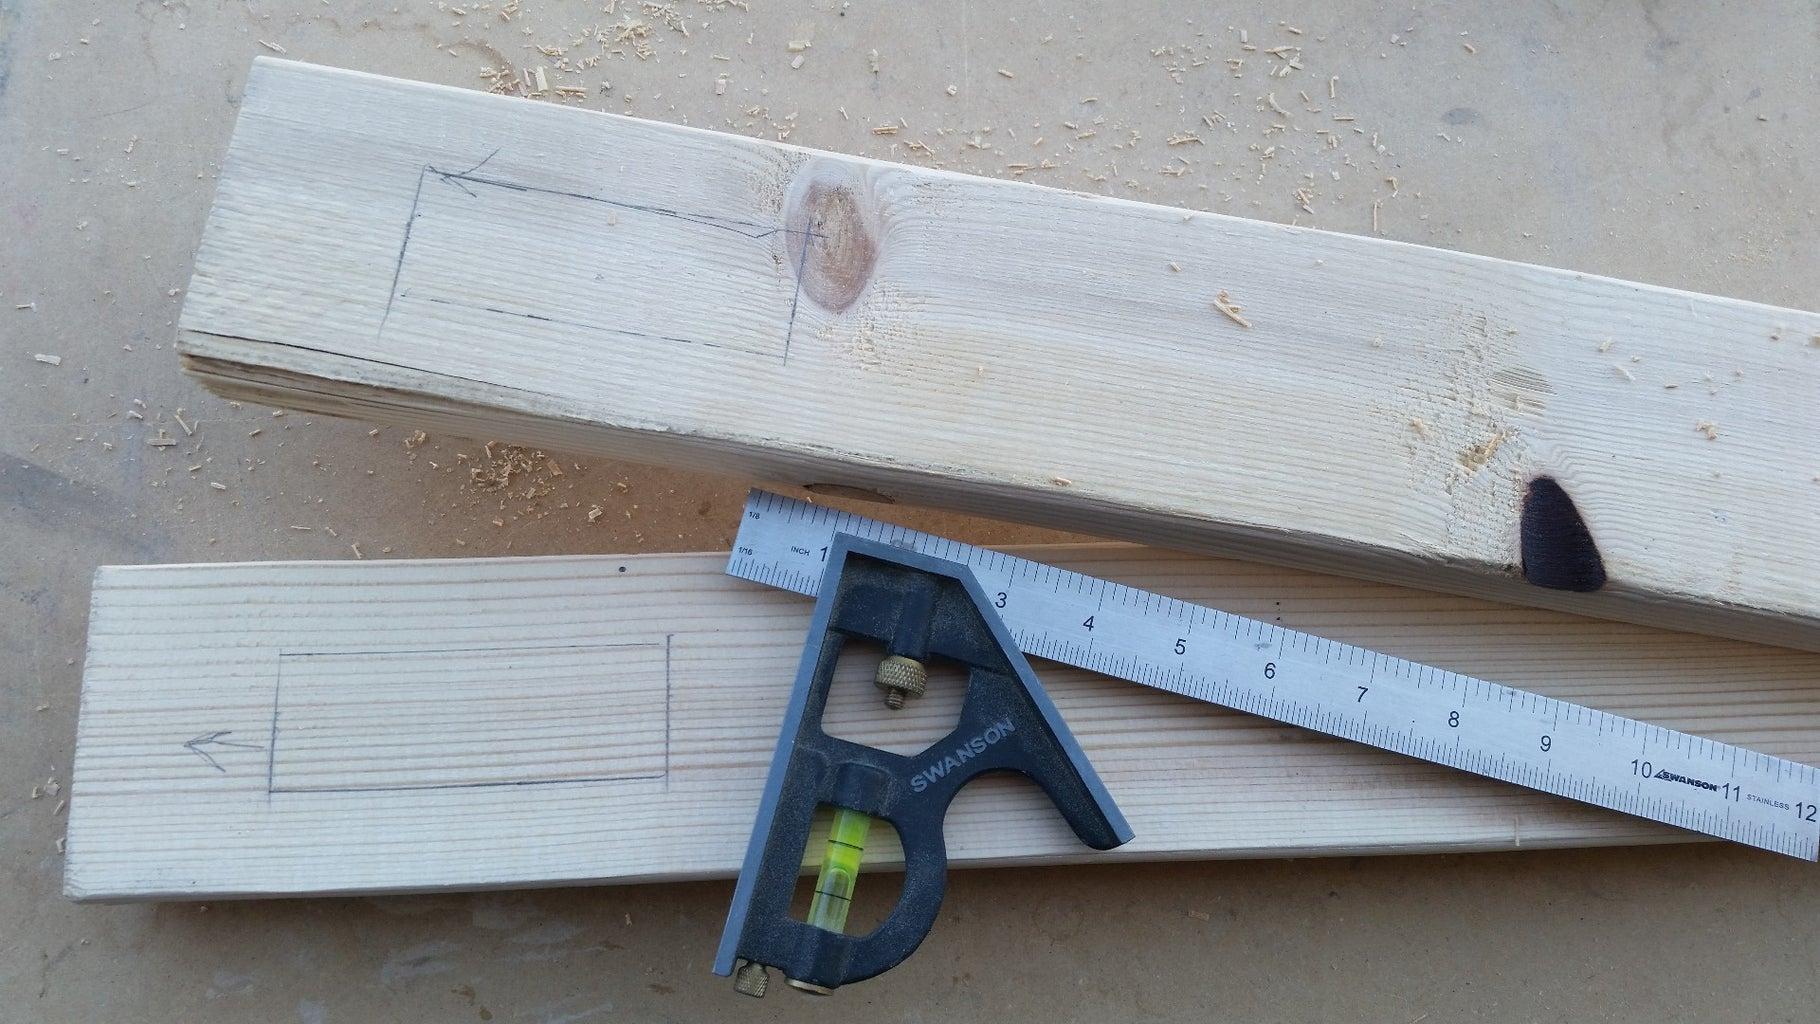 Cut Crossmember Slots in Uprights